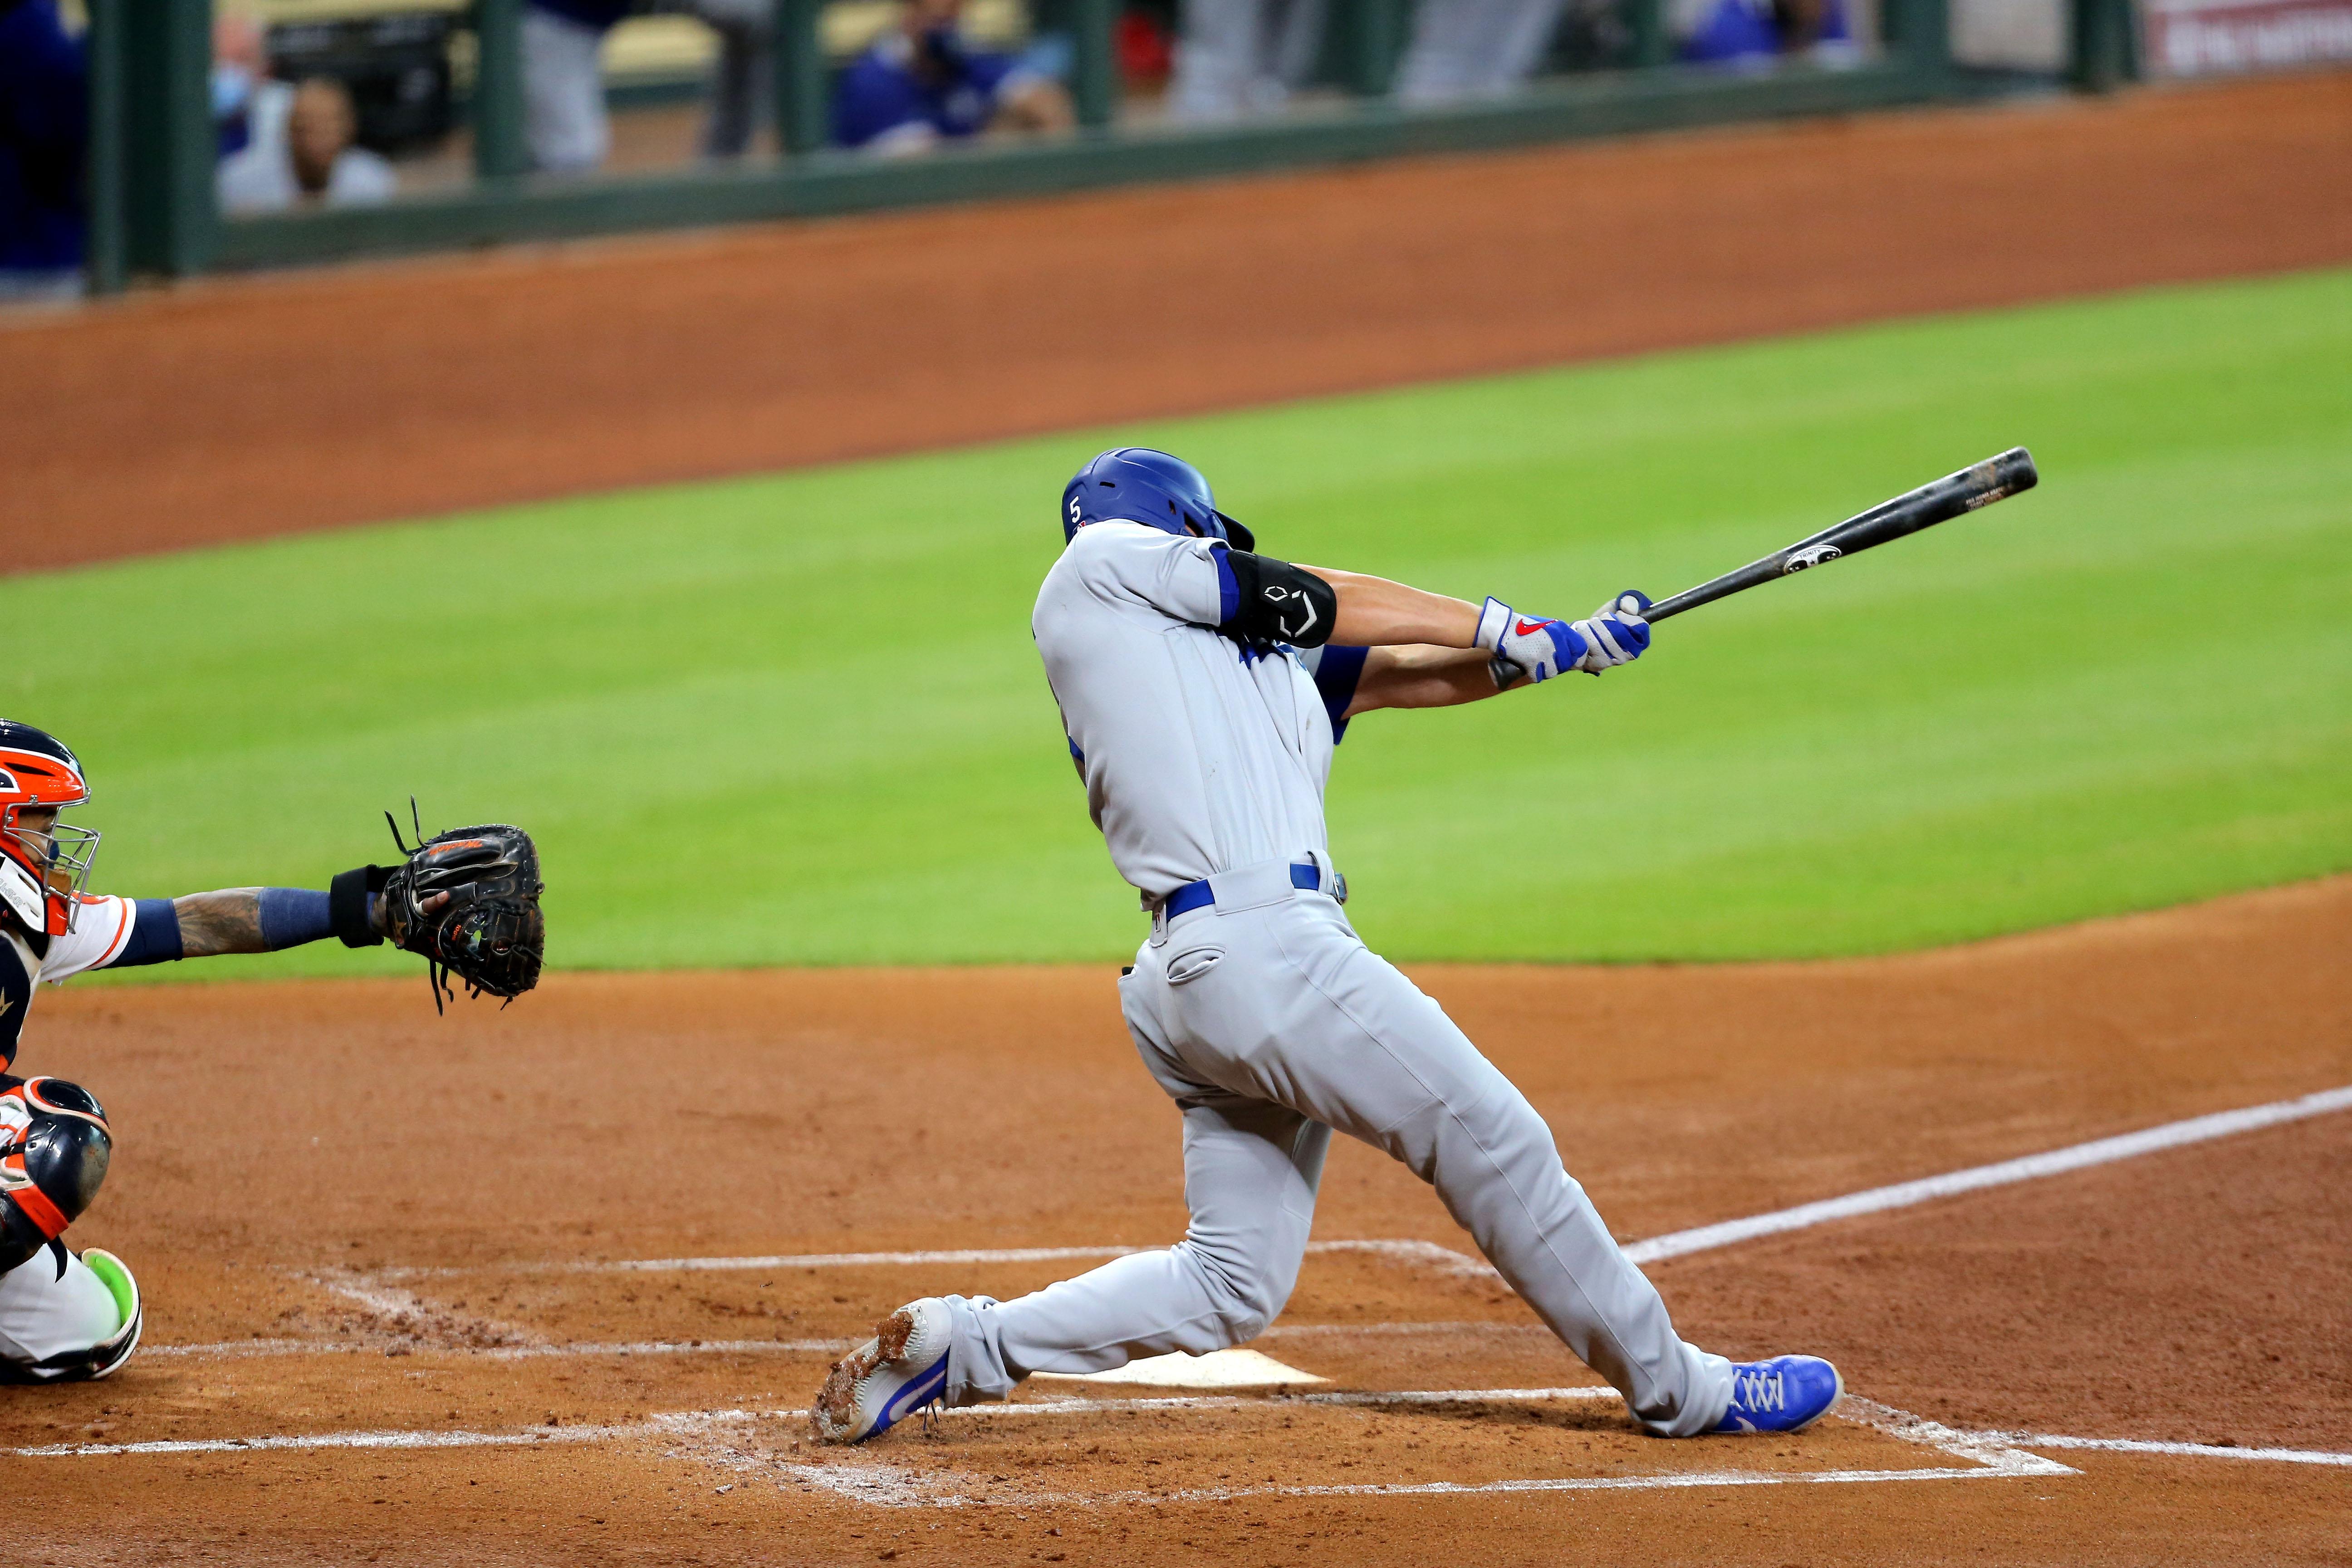 MLB: Los Angeles Dodgers at Houston Astros